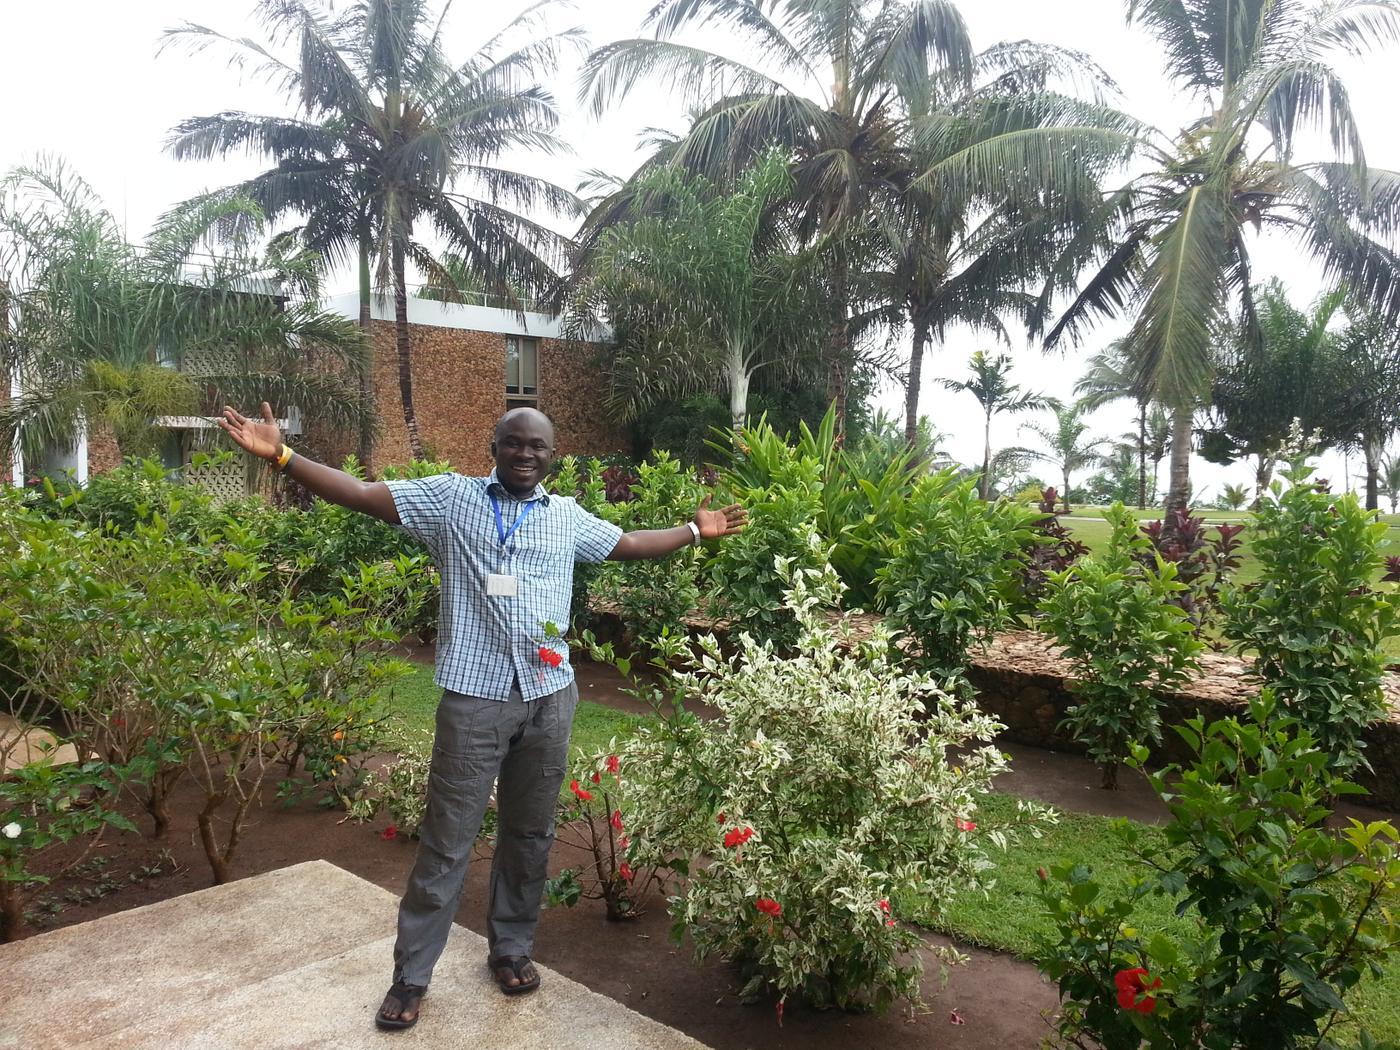 Philip Kofi Ashon